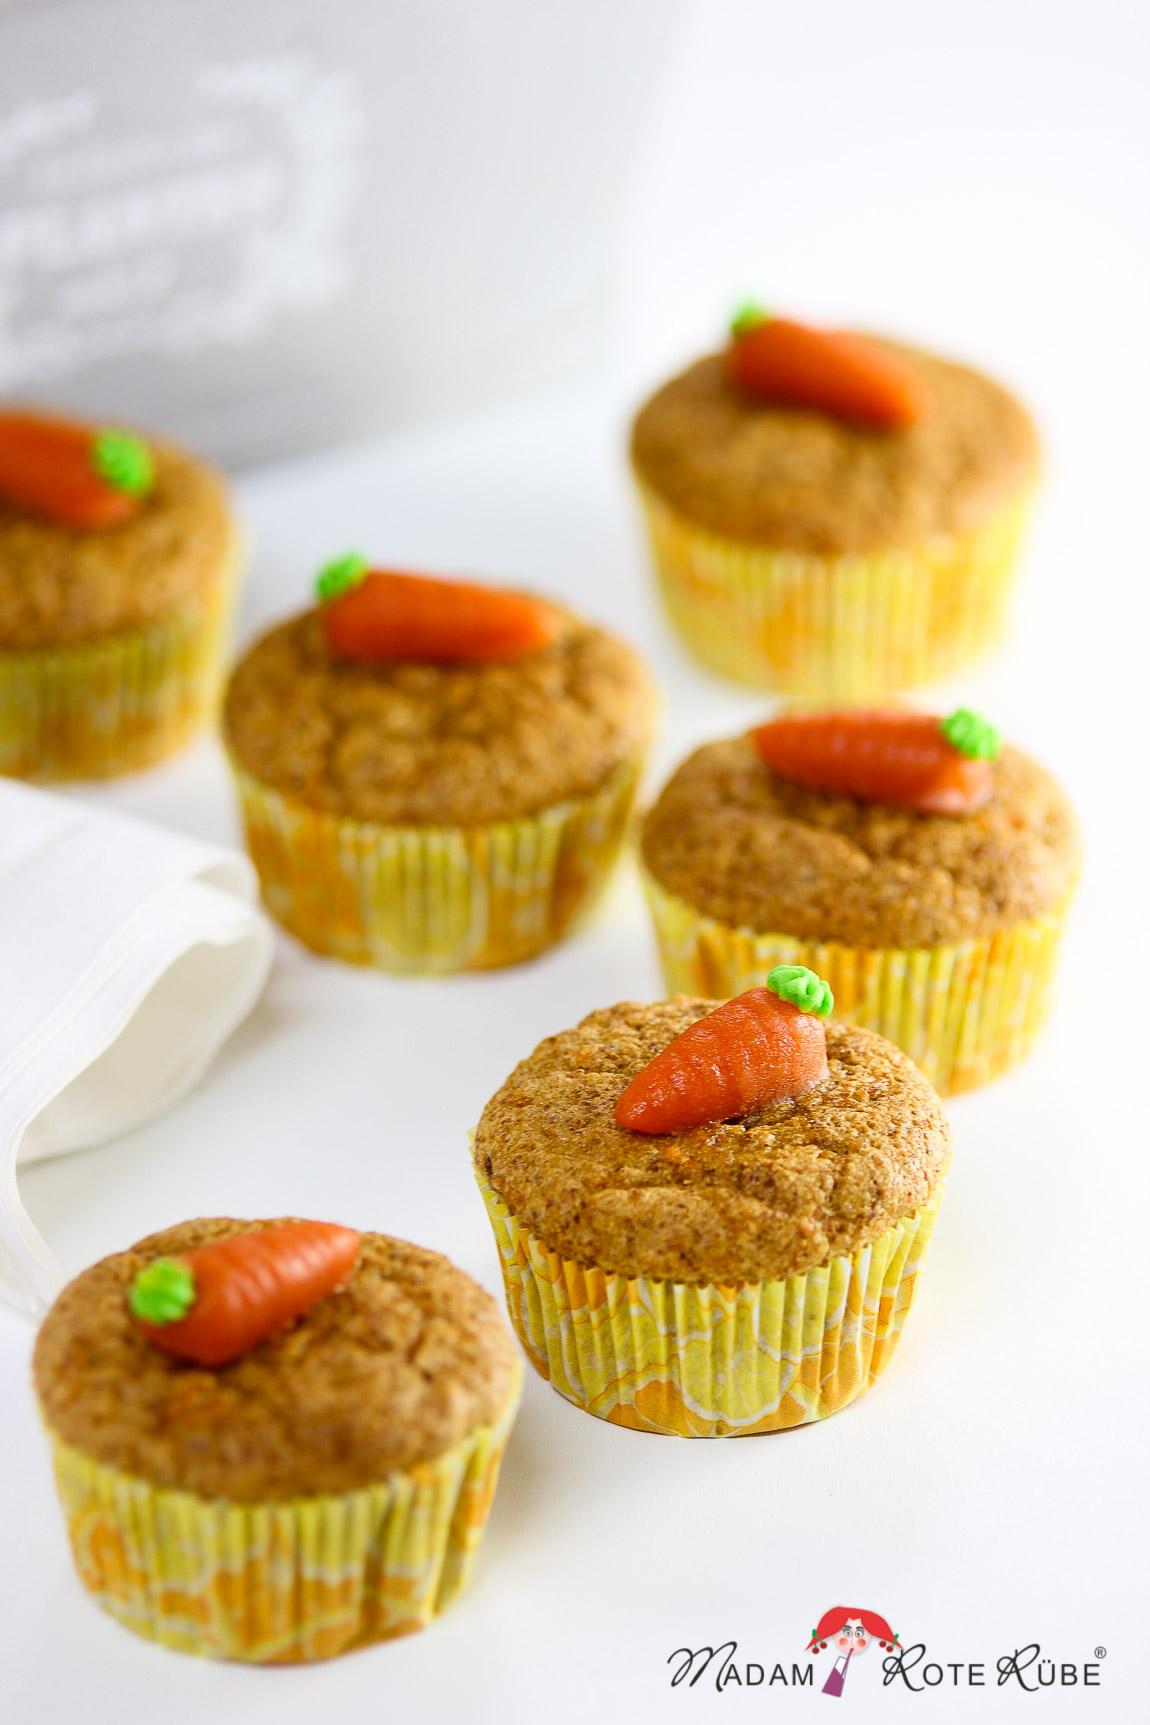 Madam Rote Rübe - süße Dinkelvollkorn-Möhrenmuffins